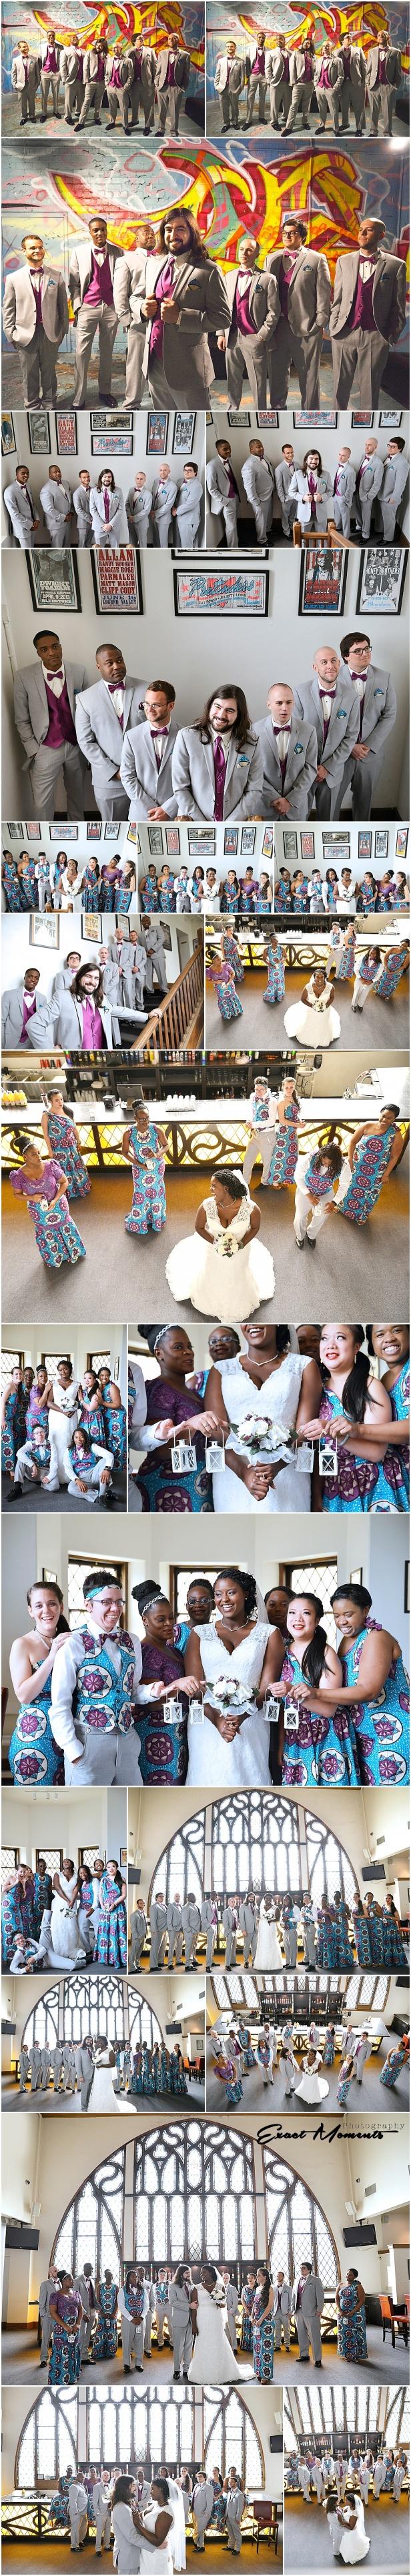 The Bluestone columbus Ohio wedding photos